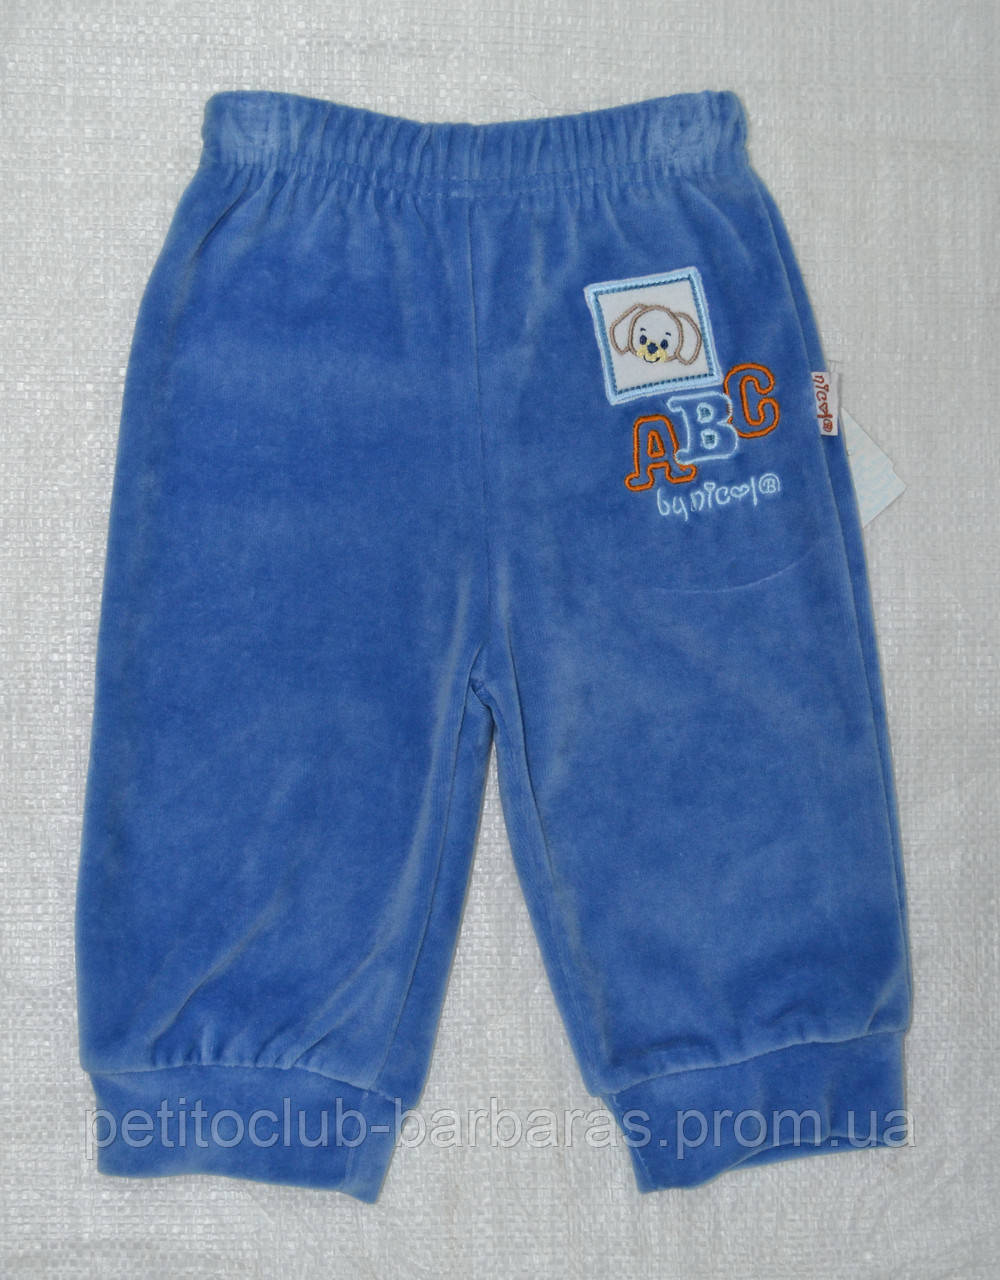 Штани велюрові АВС блакитні для хлопчика (Nicol, Польща)